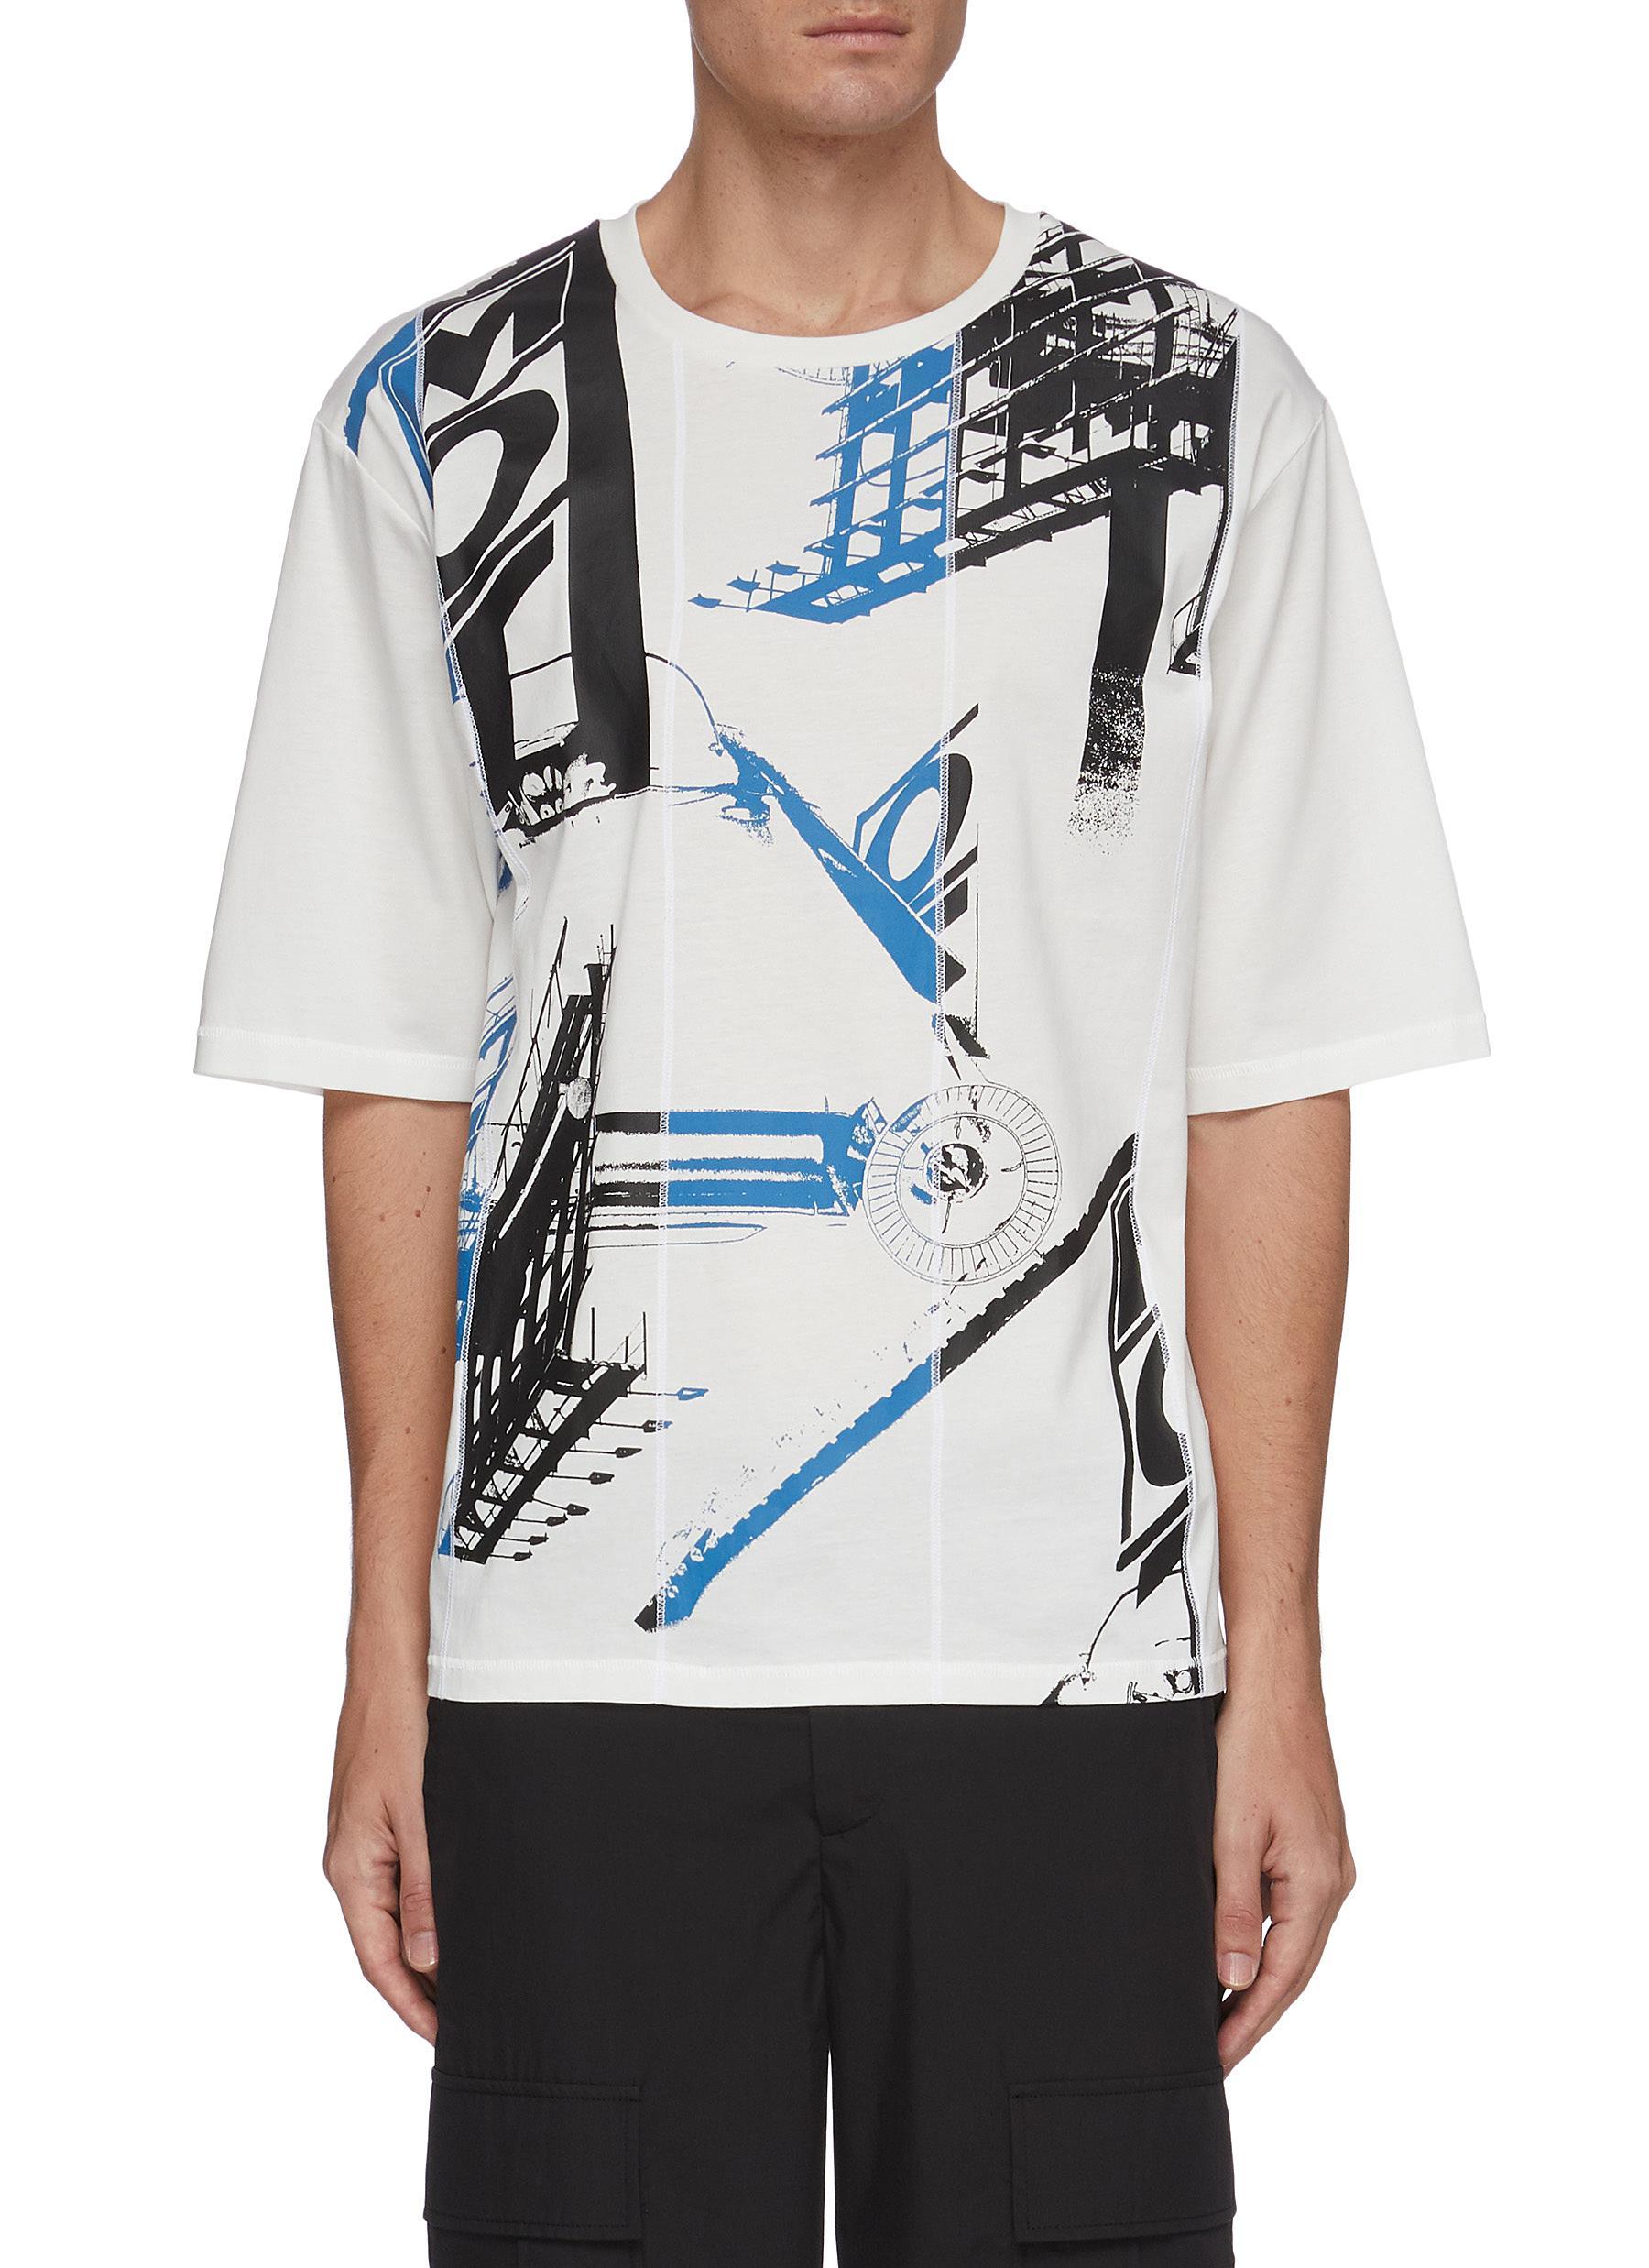 Roadster print boxy T-shirt - 3.1 PHILLIP LIM - Modalova